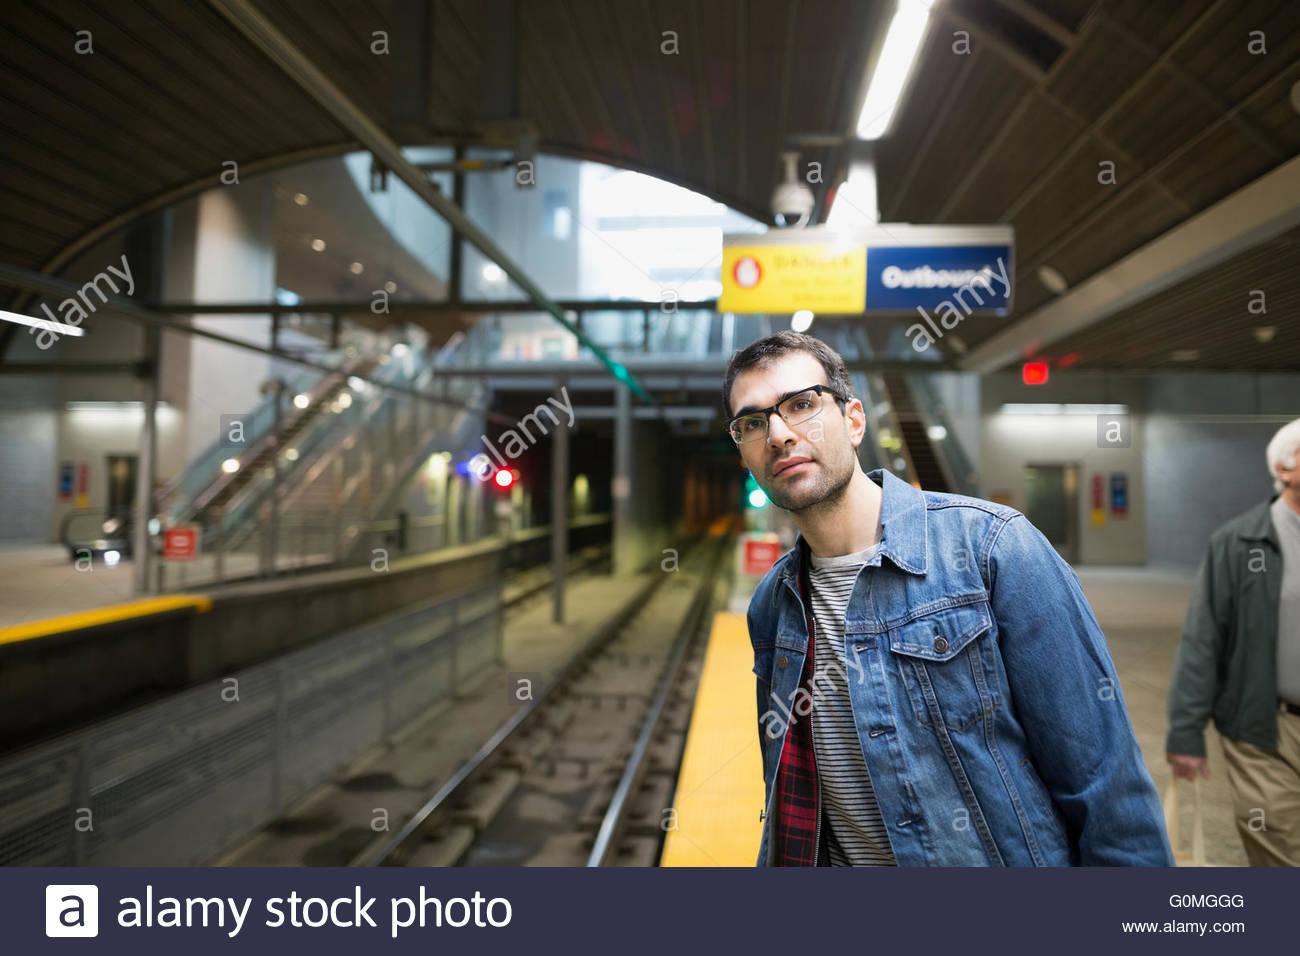 Man in eyeglasses waiting on subway station platform - Stock Image